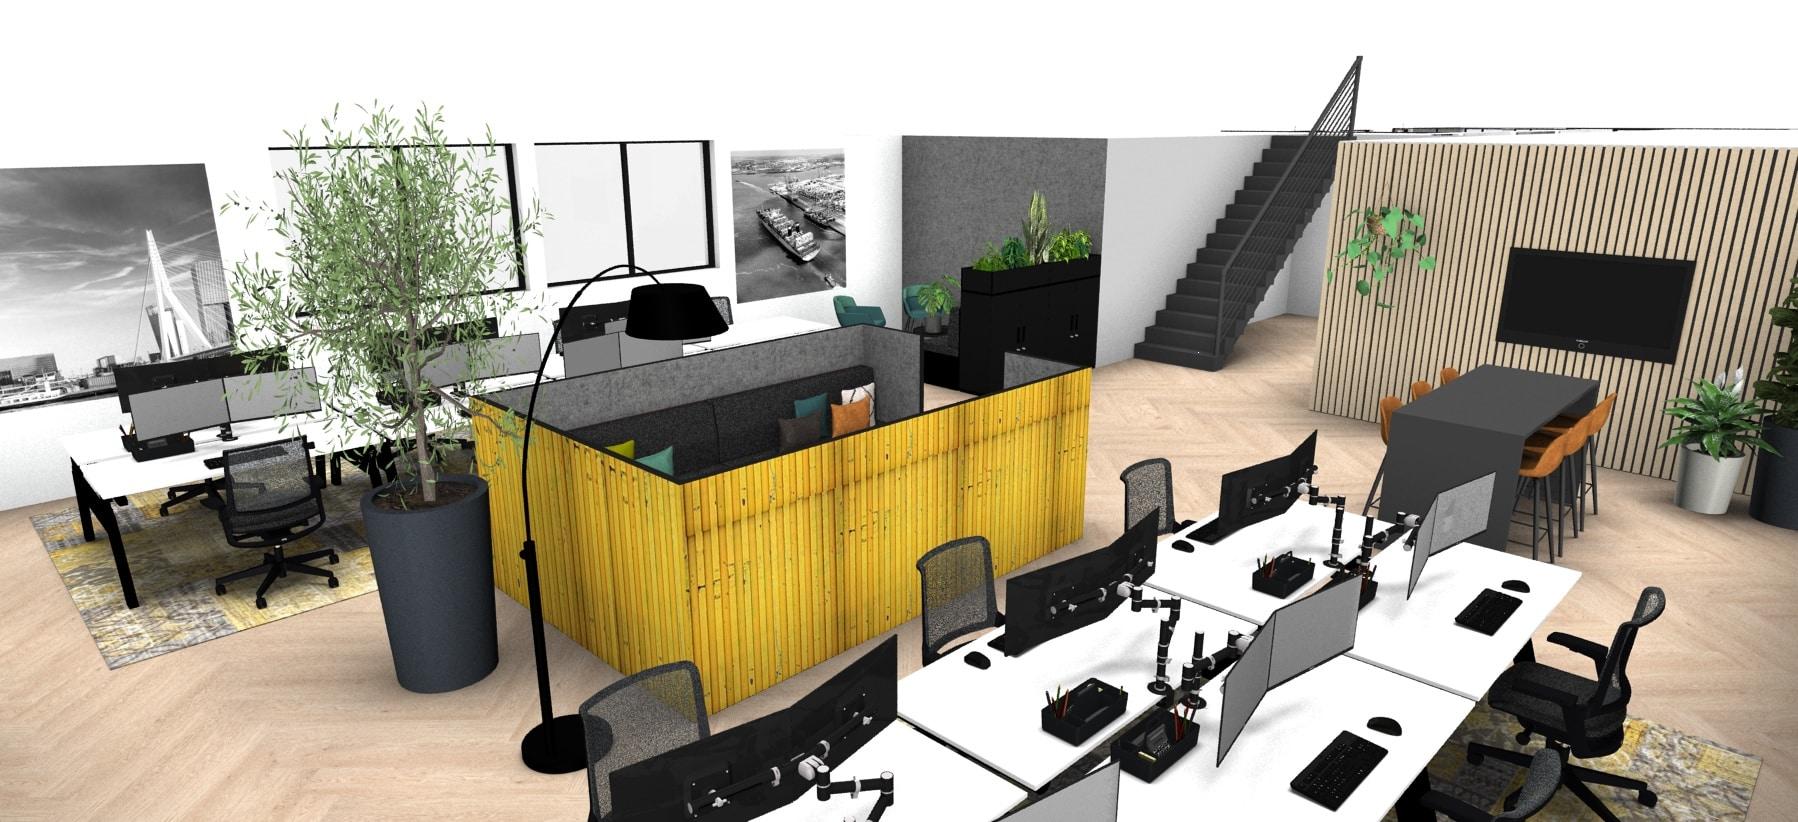 ontwerp interieur kantoor